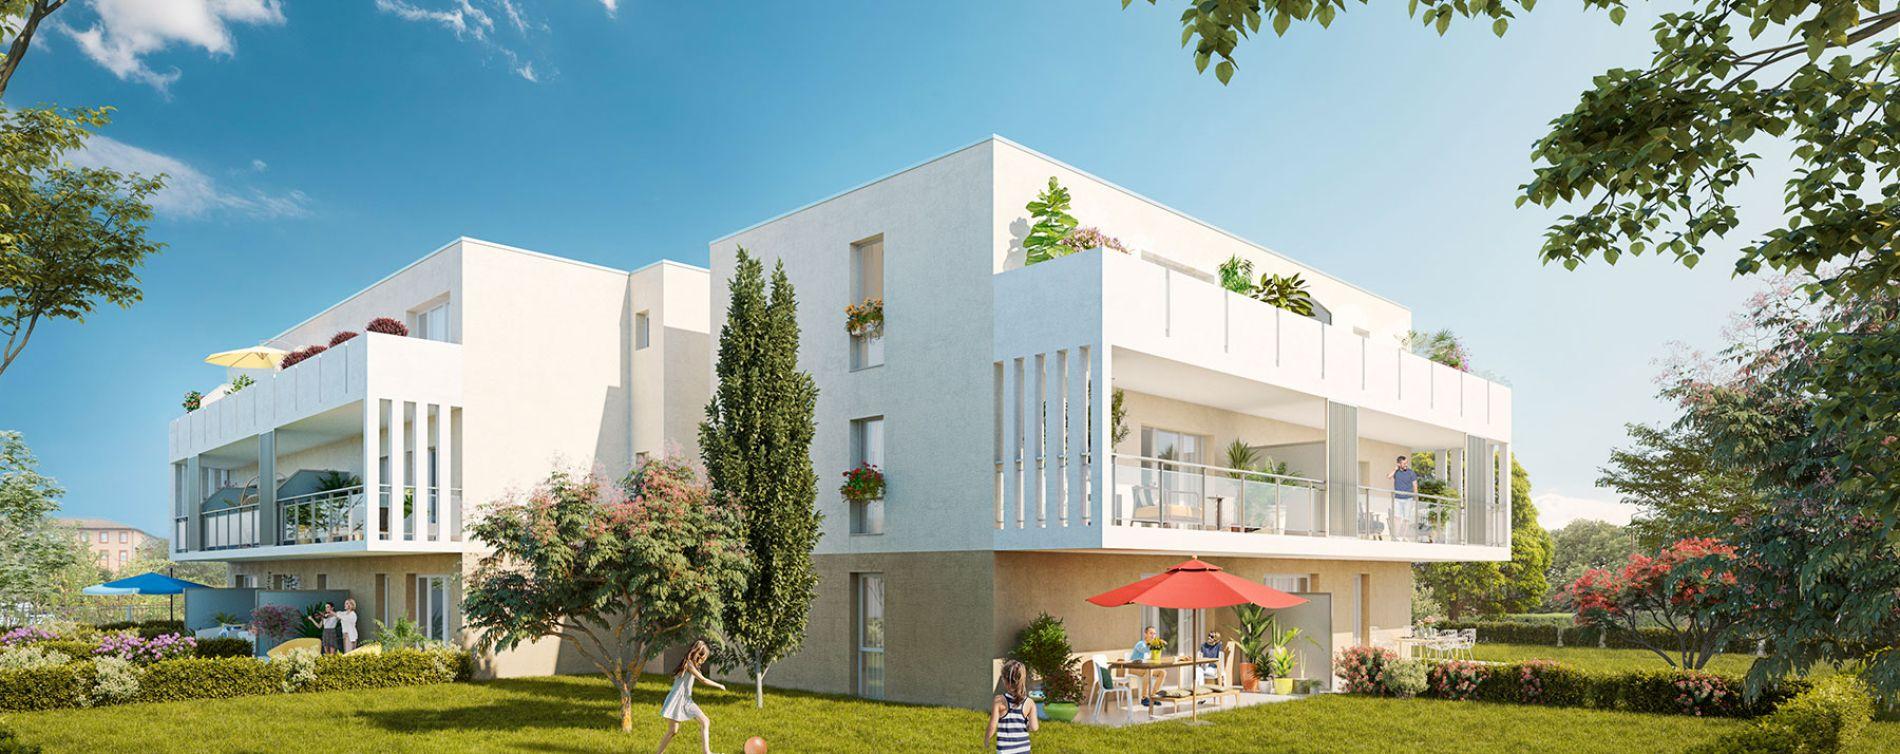 Toulouse : programme immobilier neuve « Noria » (2)